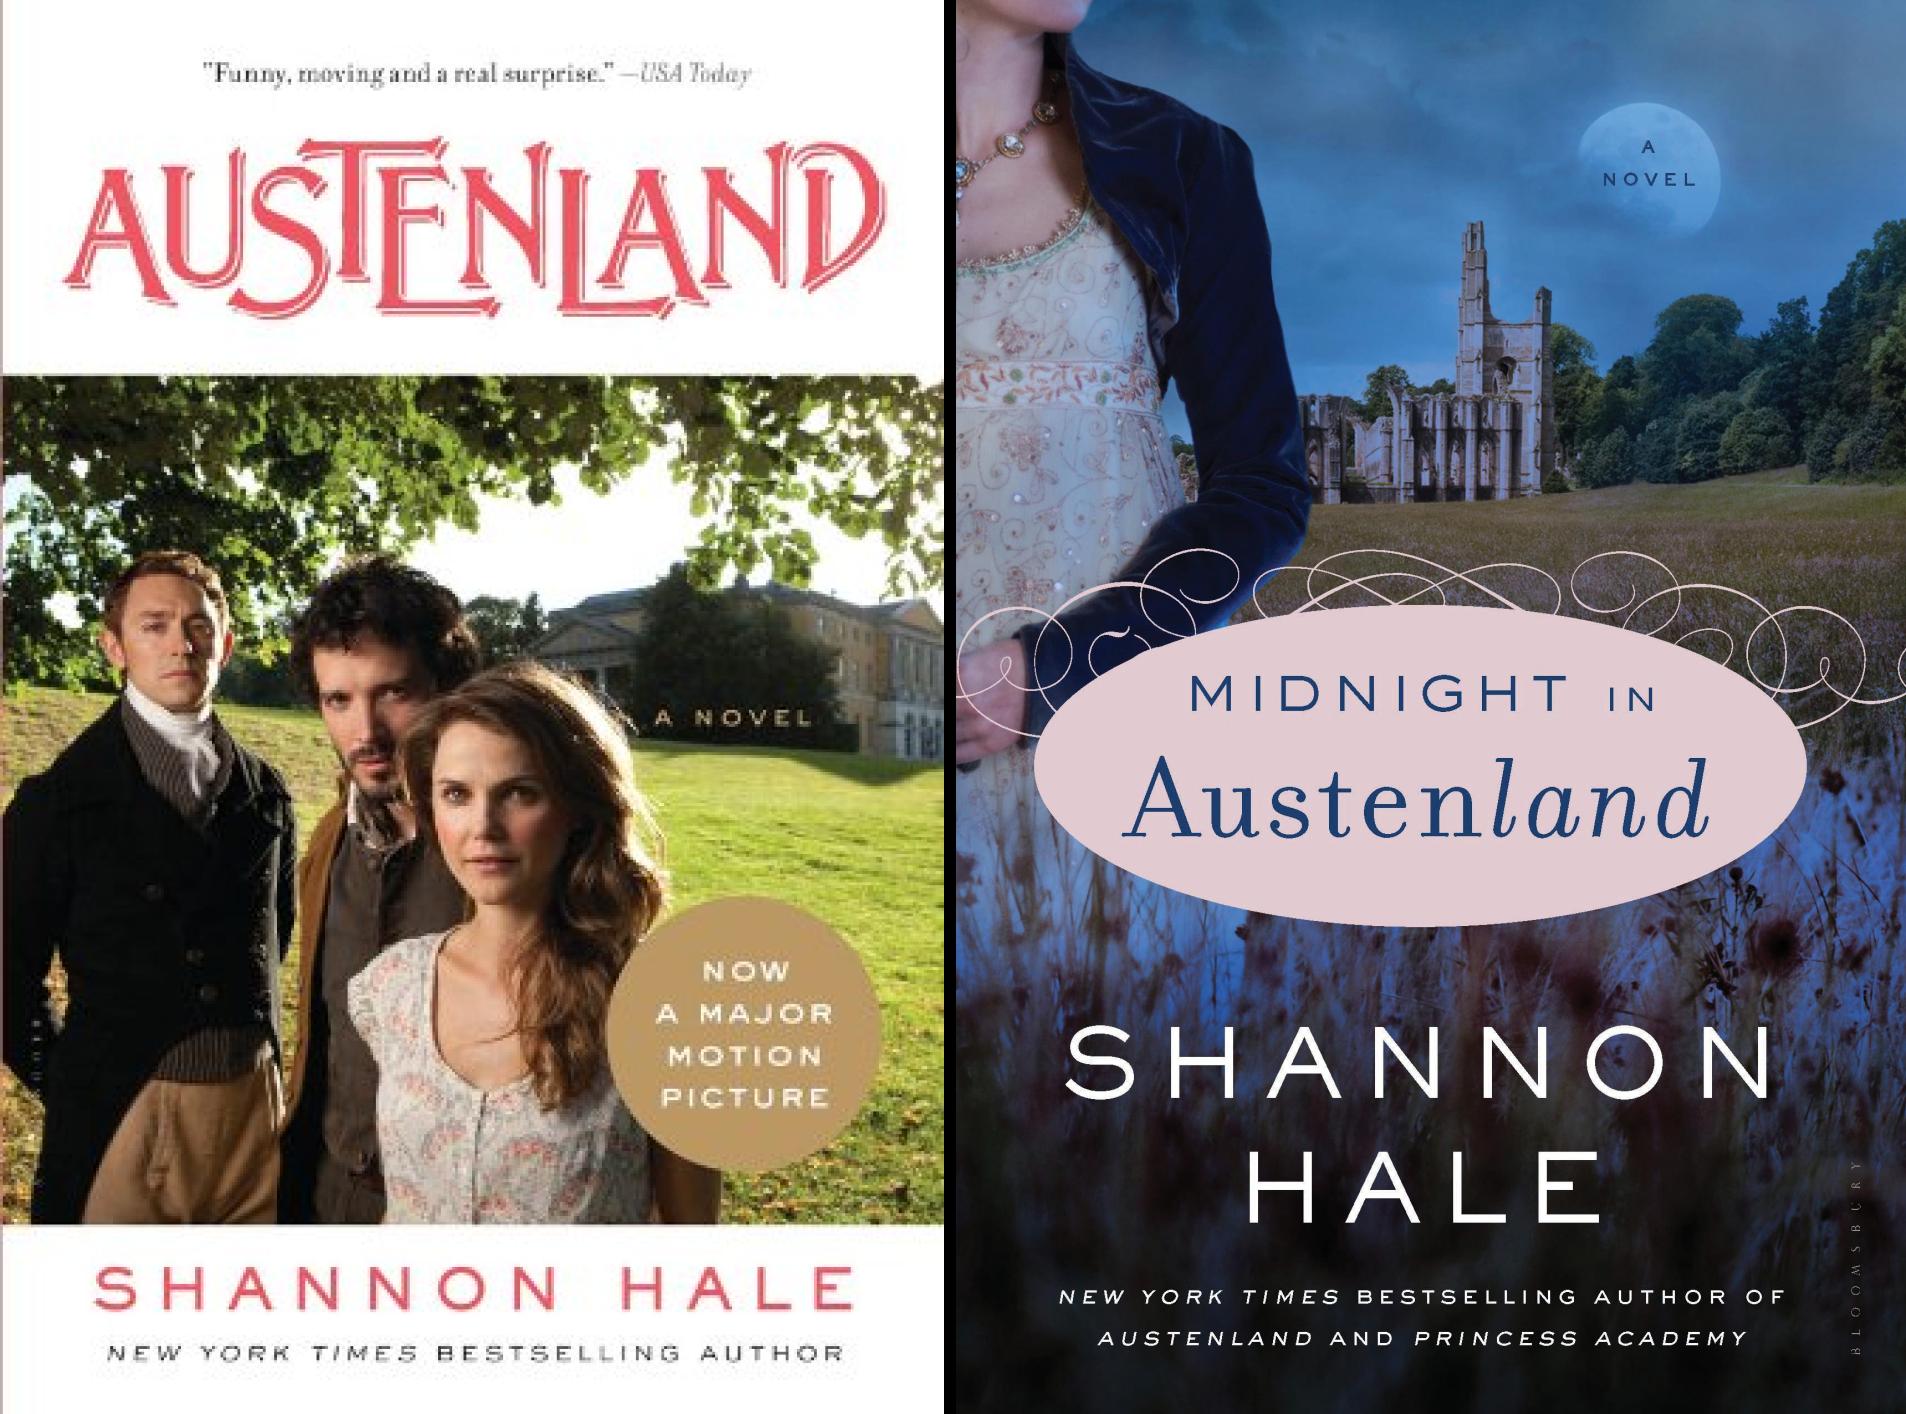 Download Austenland (2 Book Series) (B00WKOUEKA) B00WKOUEKA